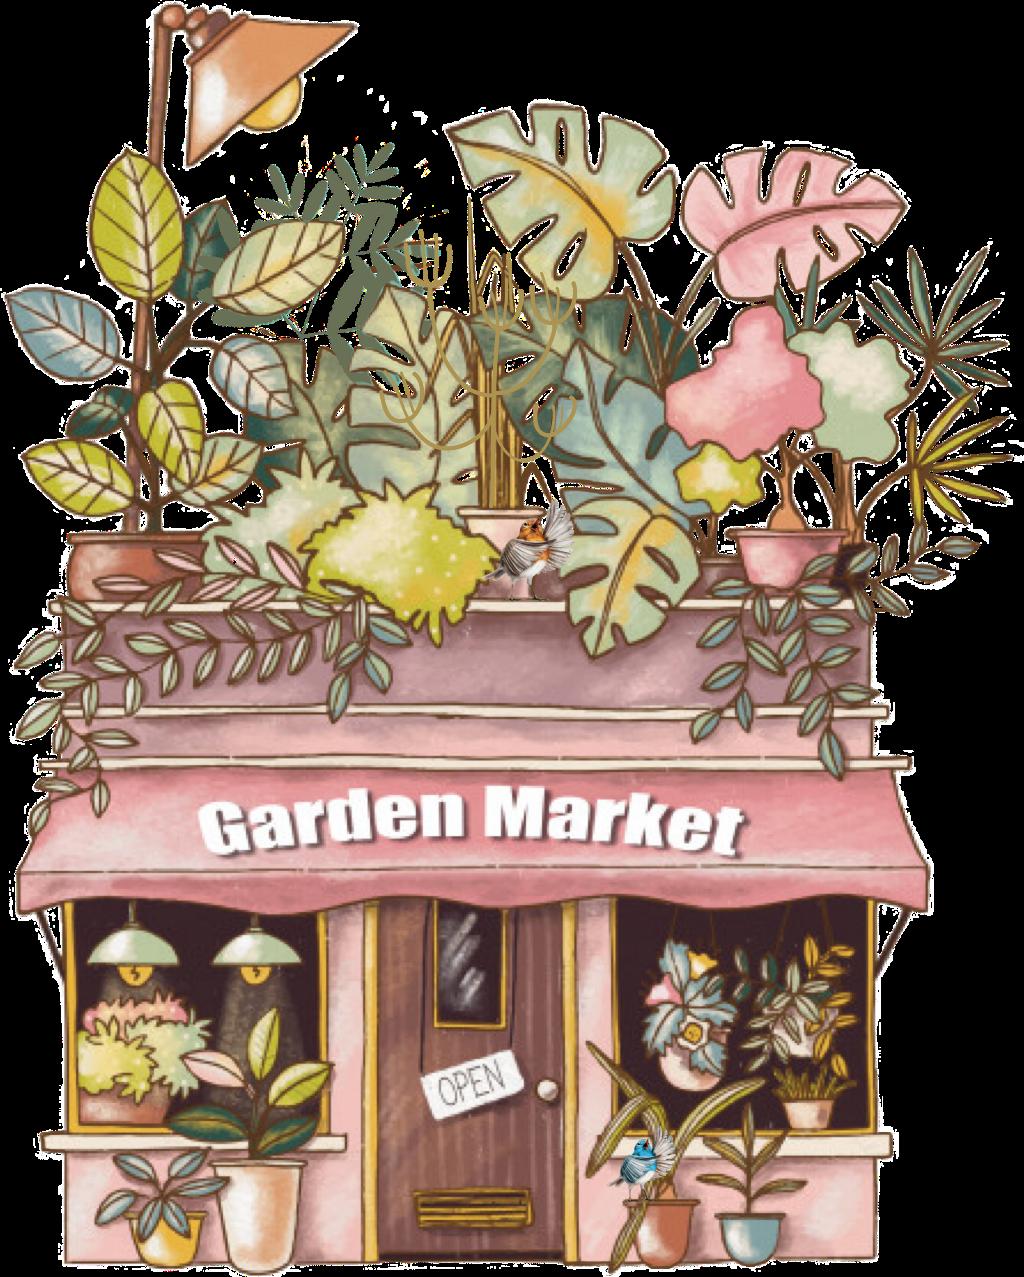 #garden #market #plants #birds #shop